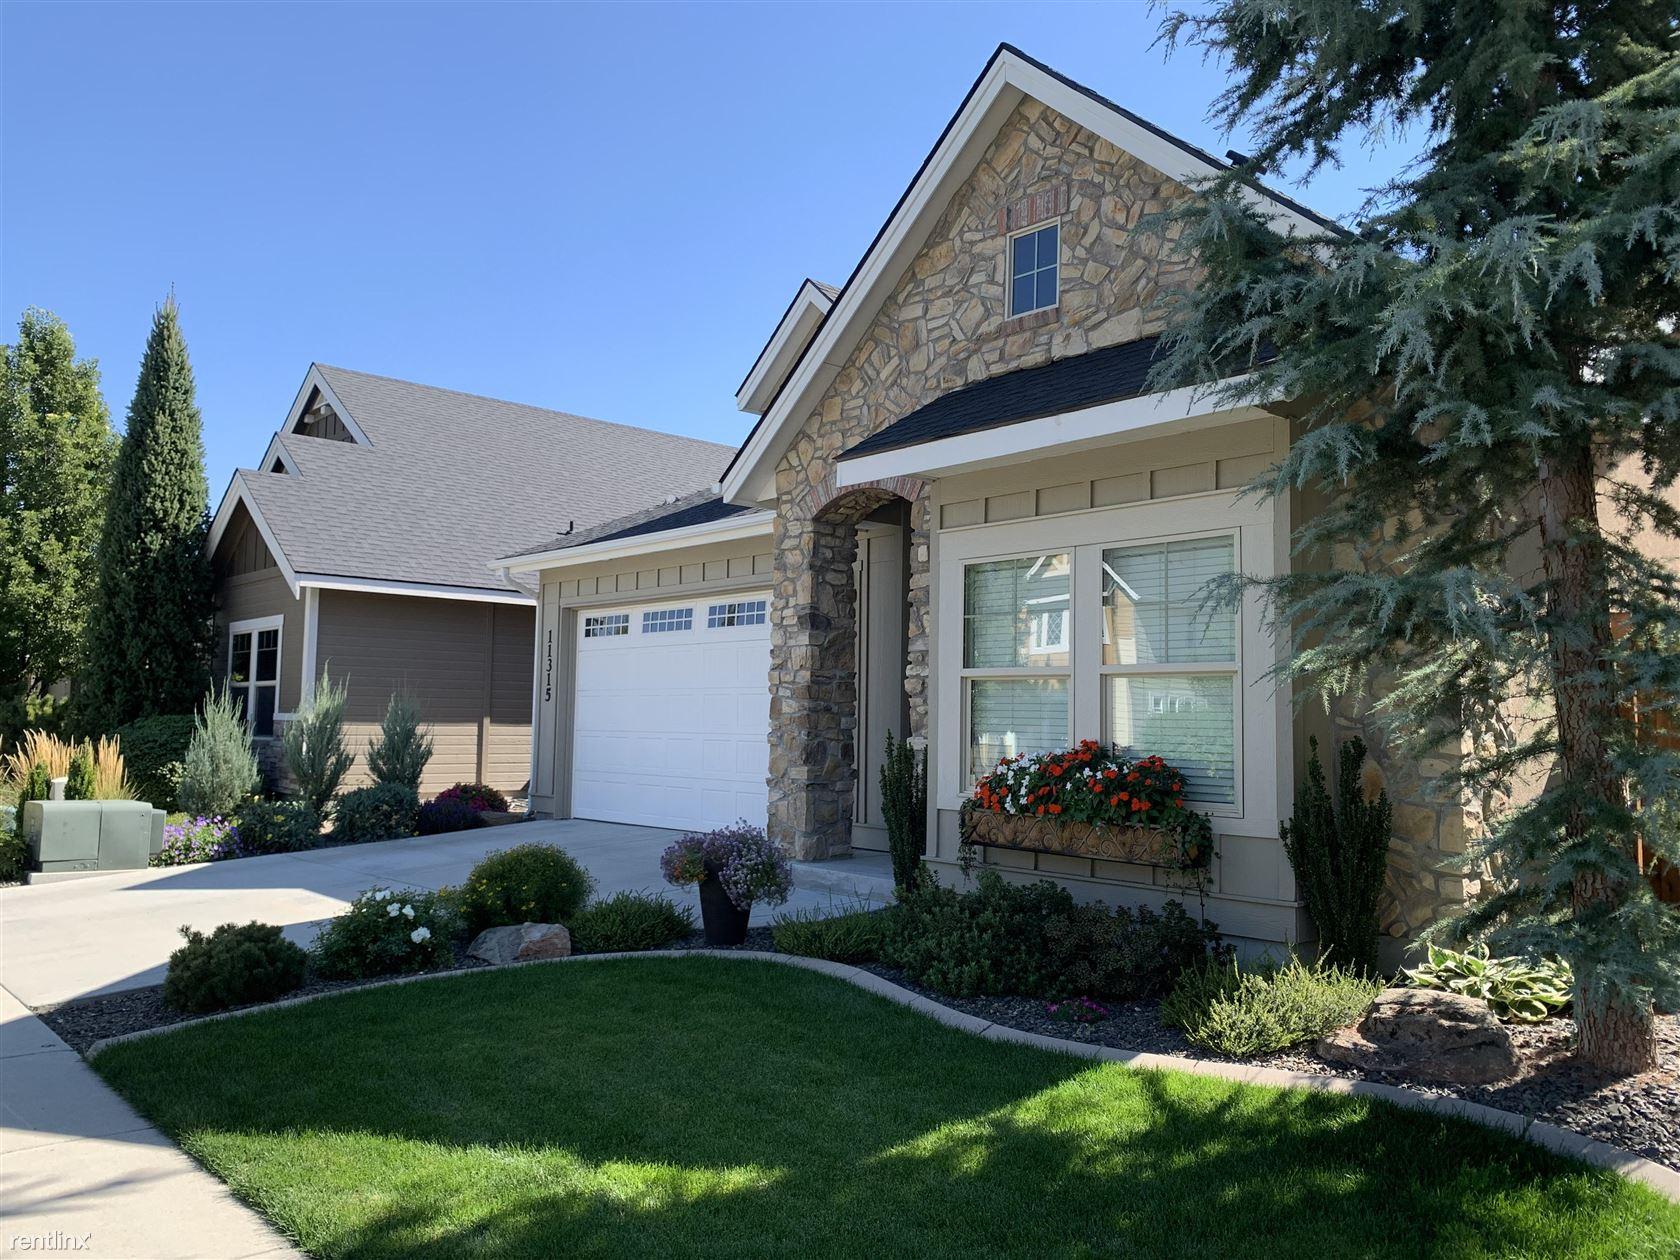 11315 West Kuhnen Drive - 2800USD / month